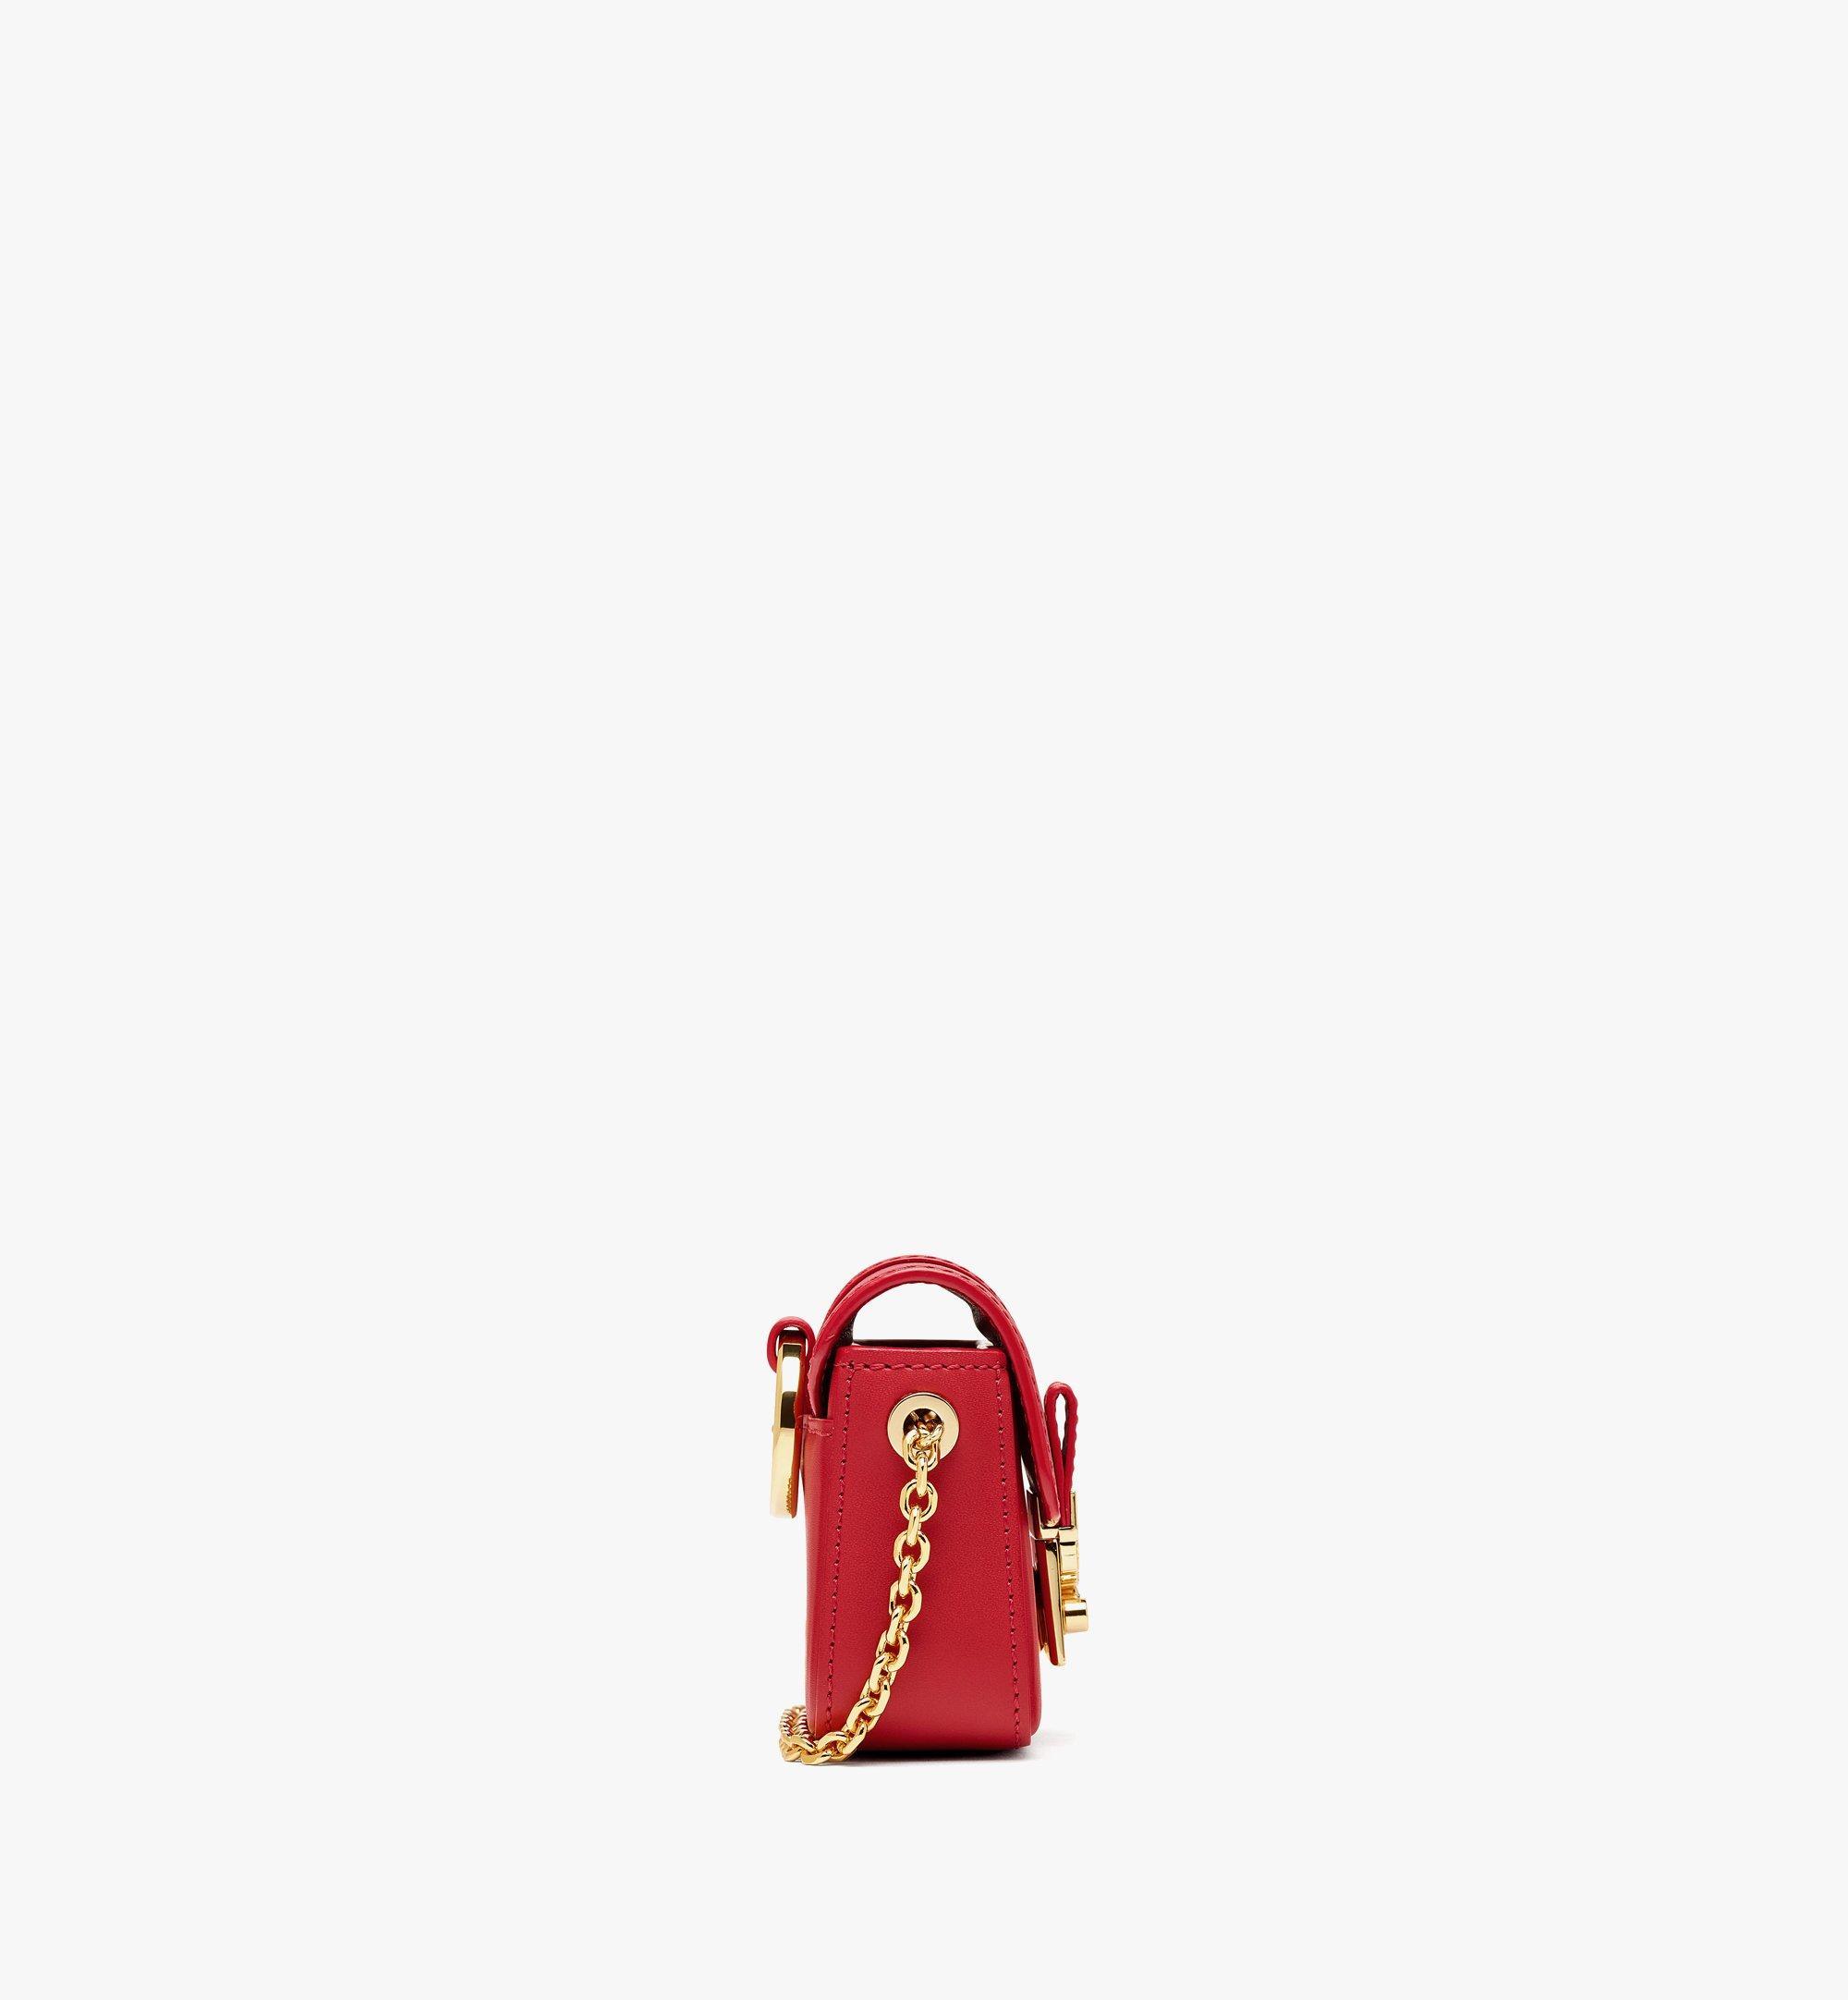 MCM Vachetta 皮革 Tracy Airpods 保護盒 Red MXZBSXT02RU001 更多視圖 1